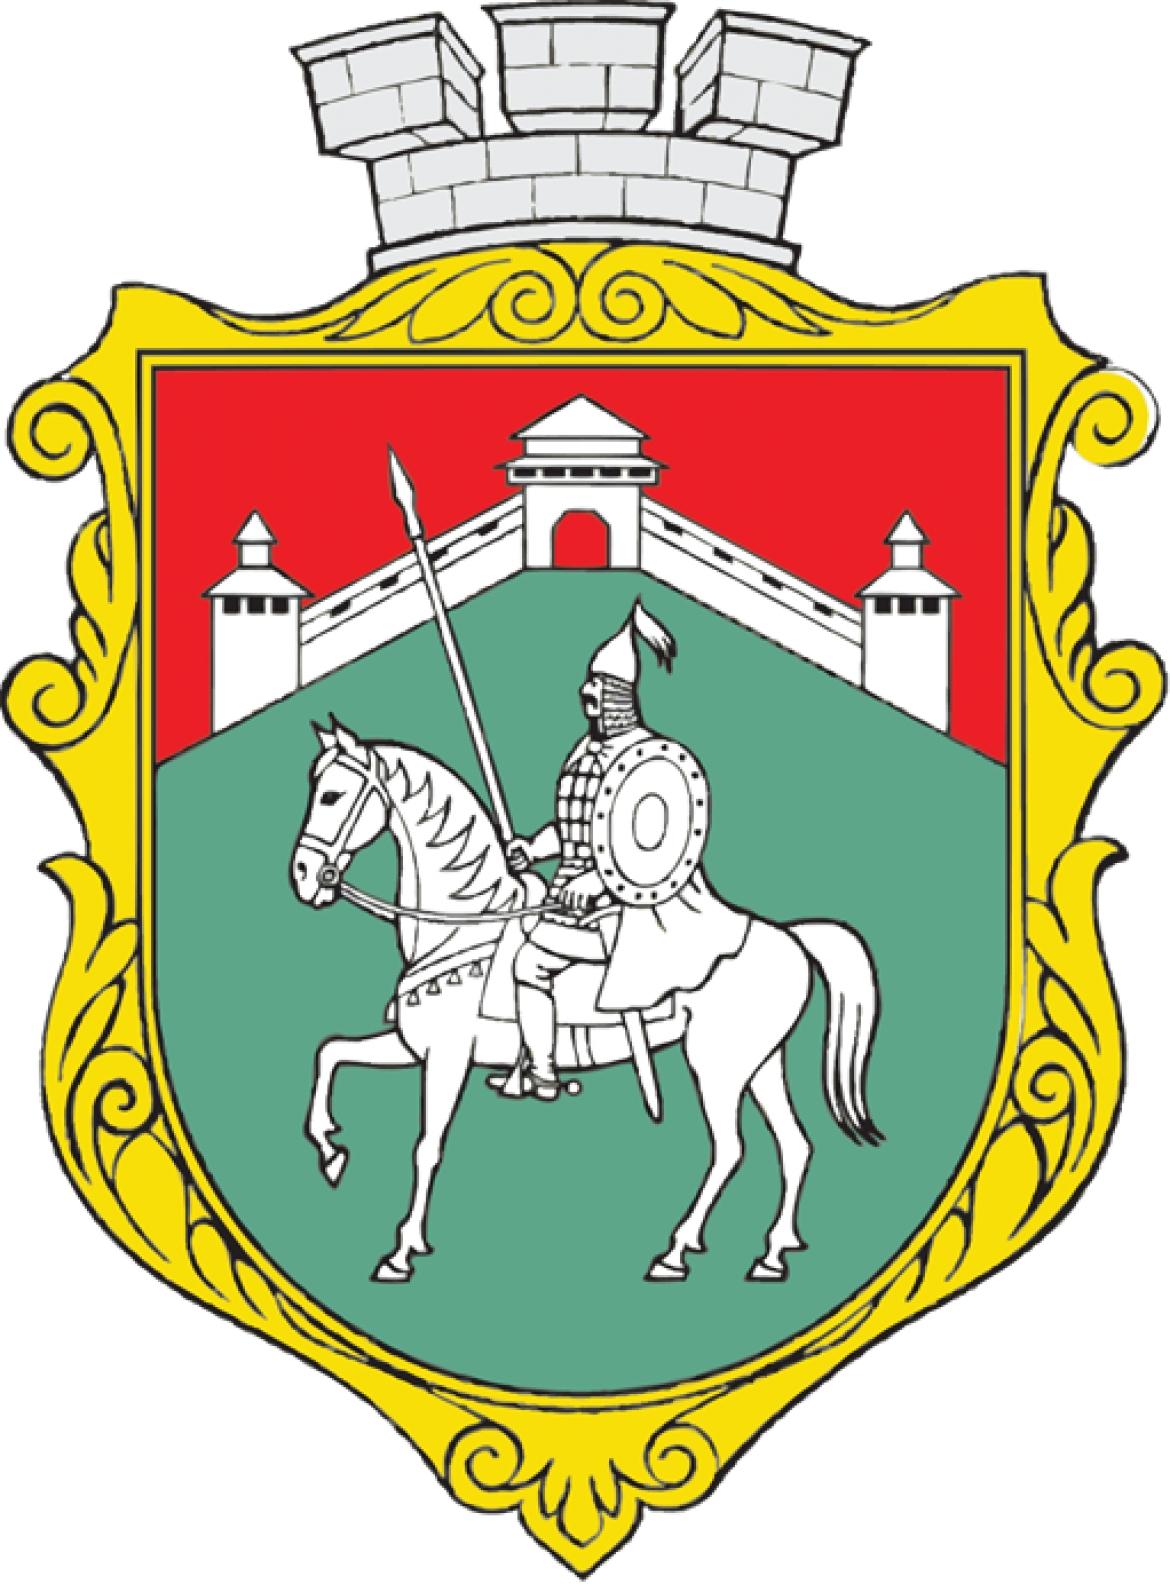 vykonavchyi-komitet-tetiivskoi-miskoi-rady